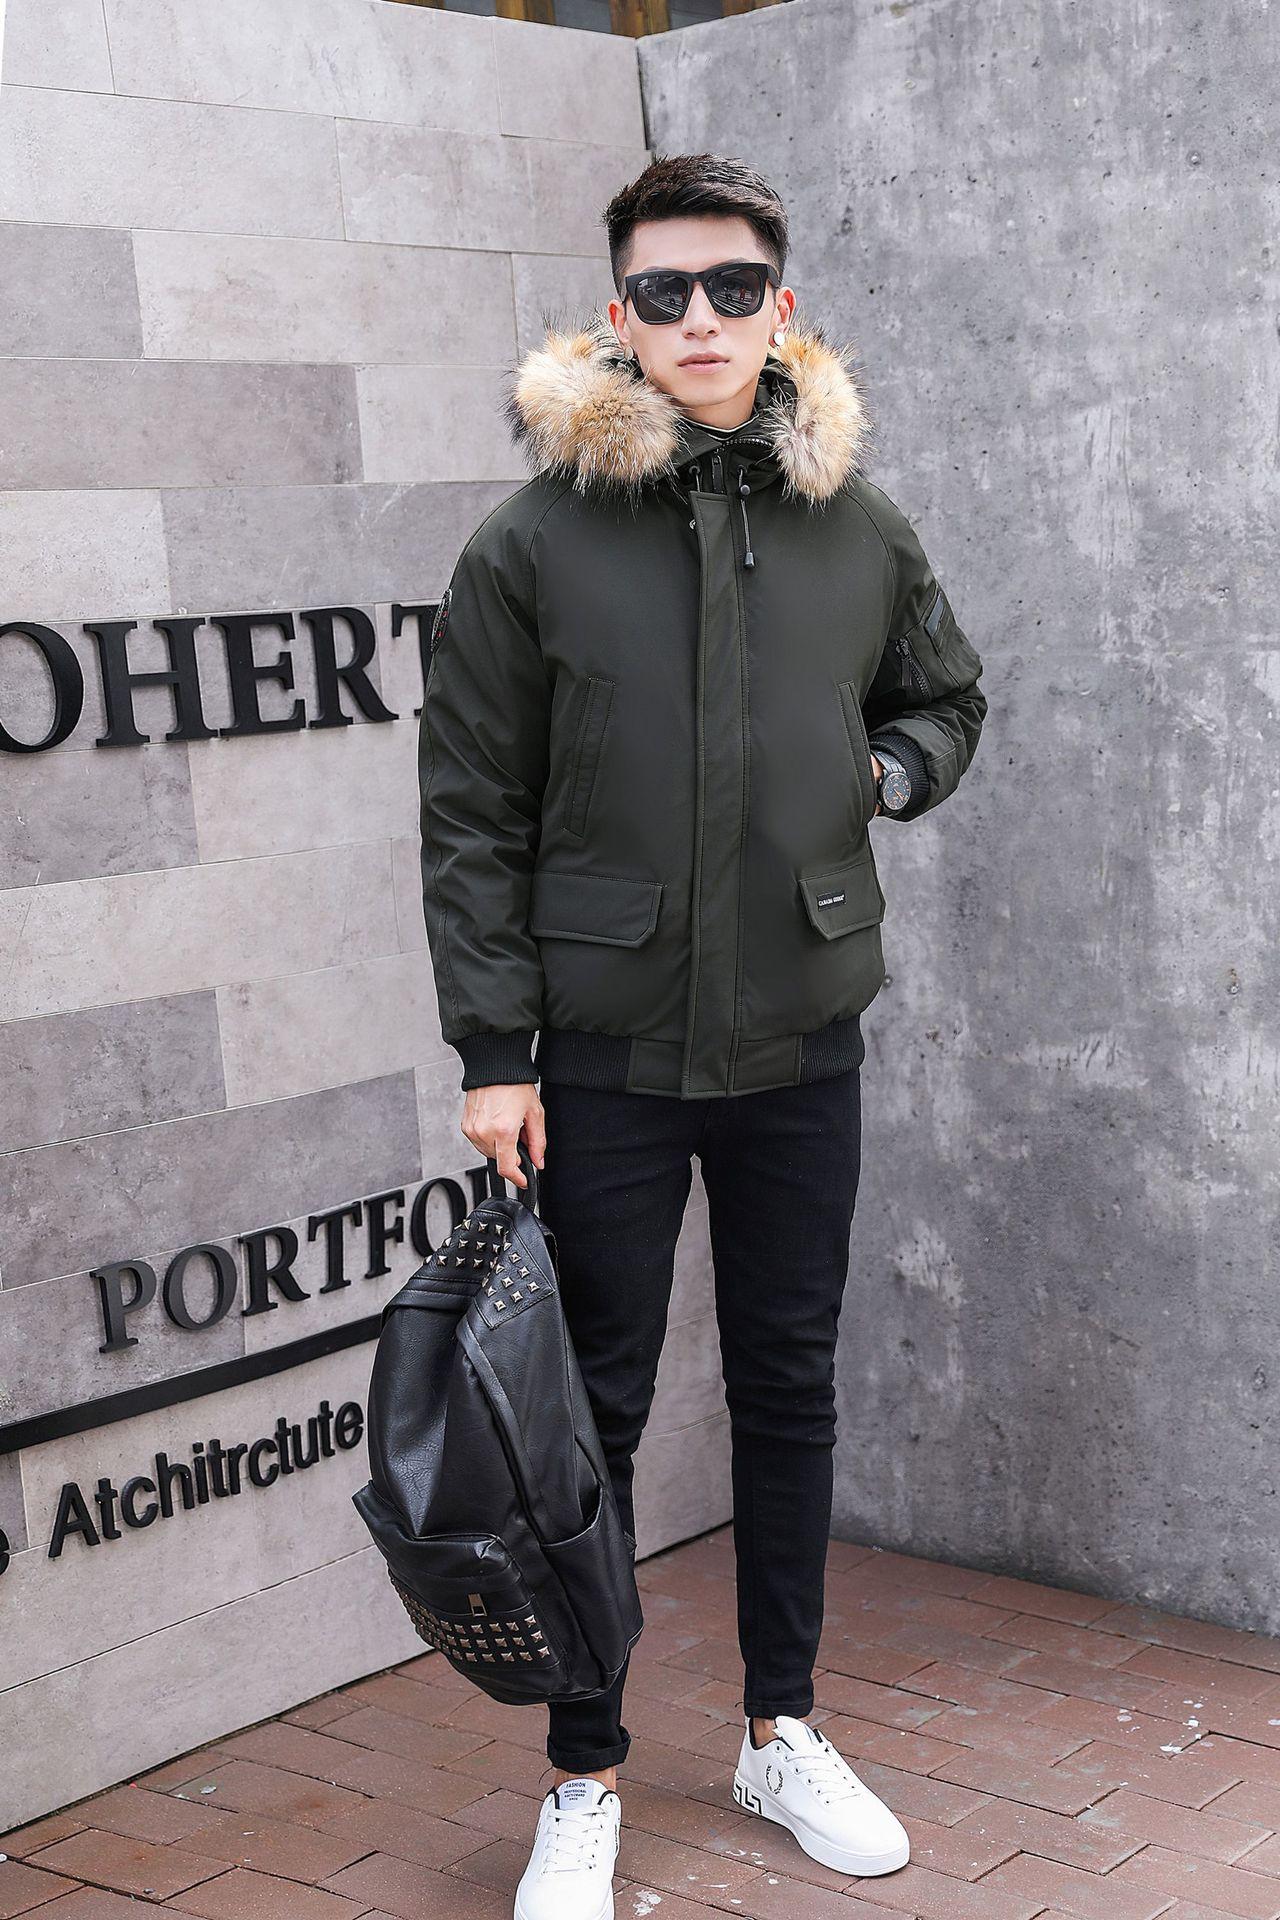 Woxingwosu Herren Daunenjacke Wintermantel lose große Meter kurze Verdickung junge Studenten Männer Daunenmantel Größe M bis 4XL